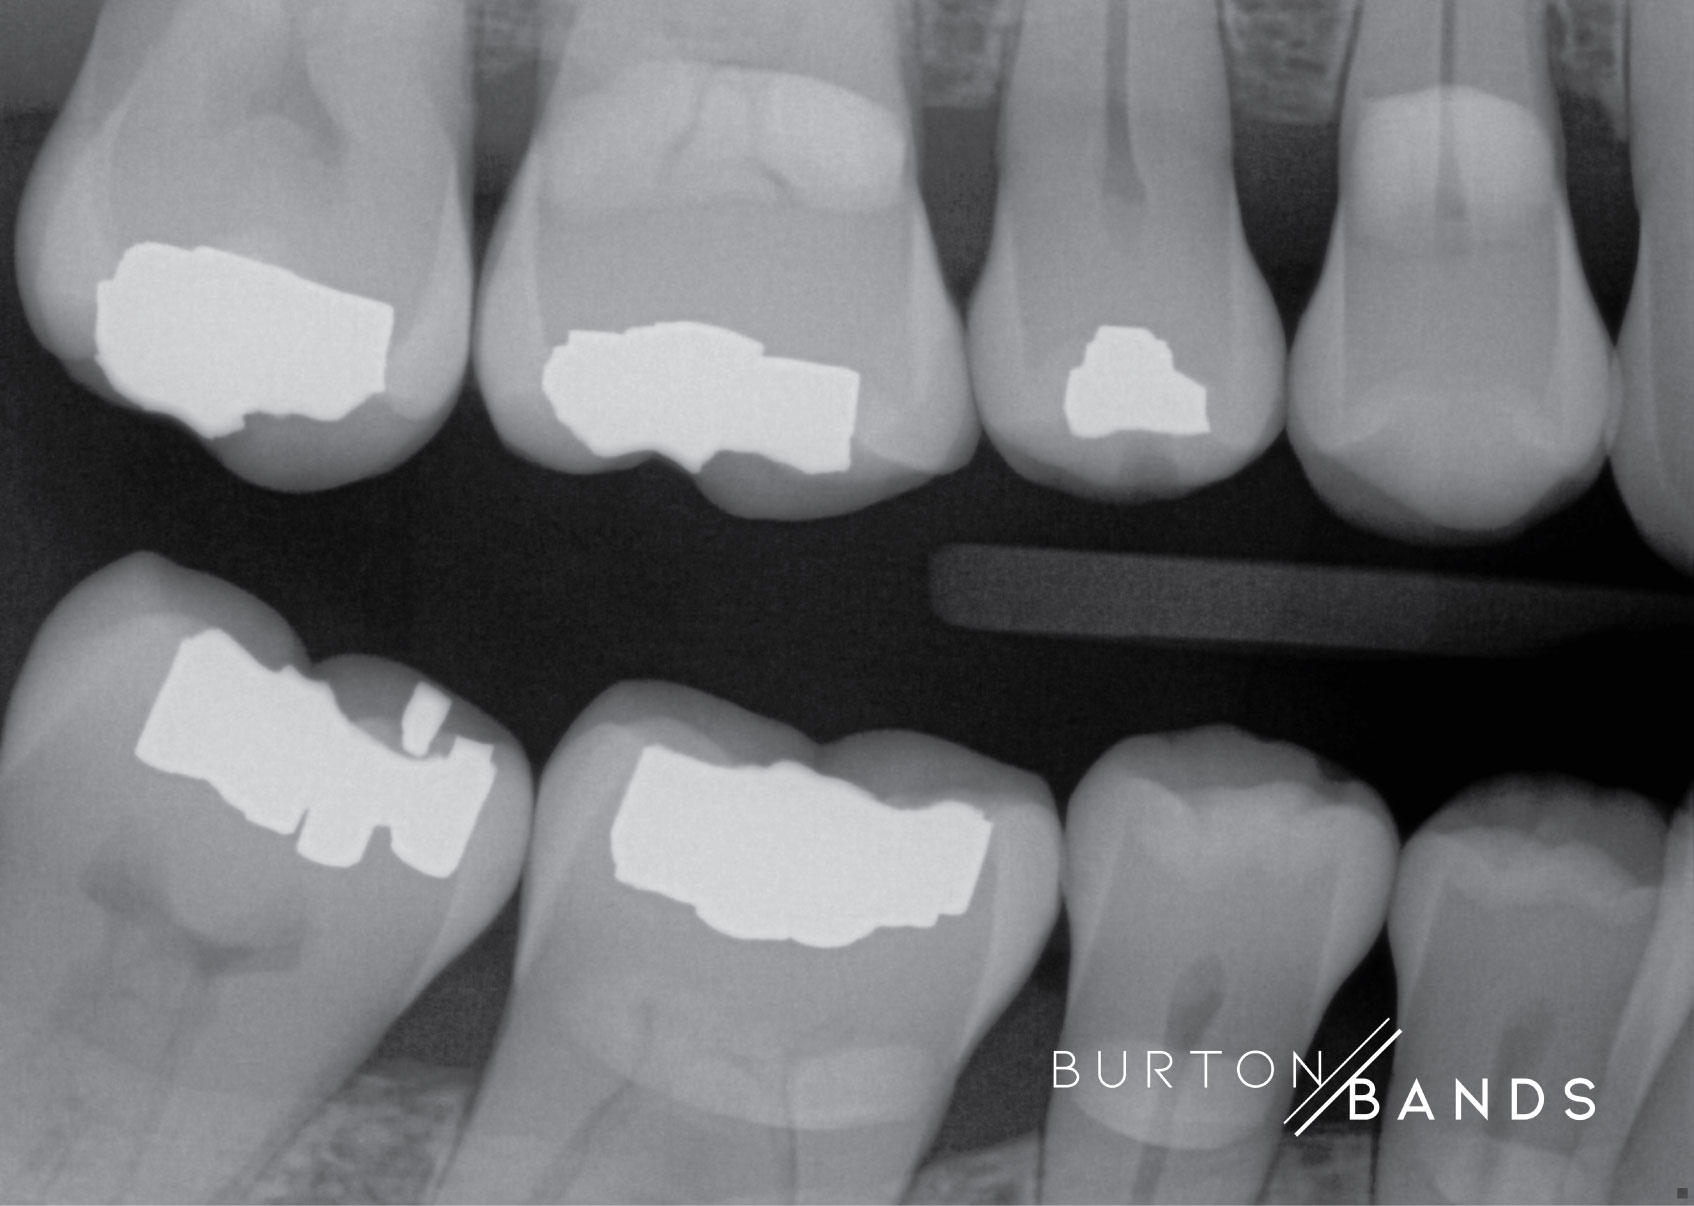 burton-image-1.jpg